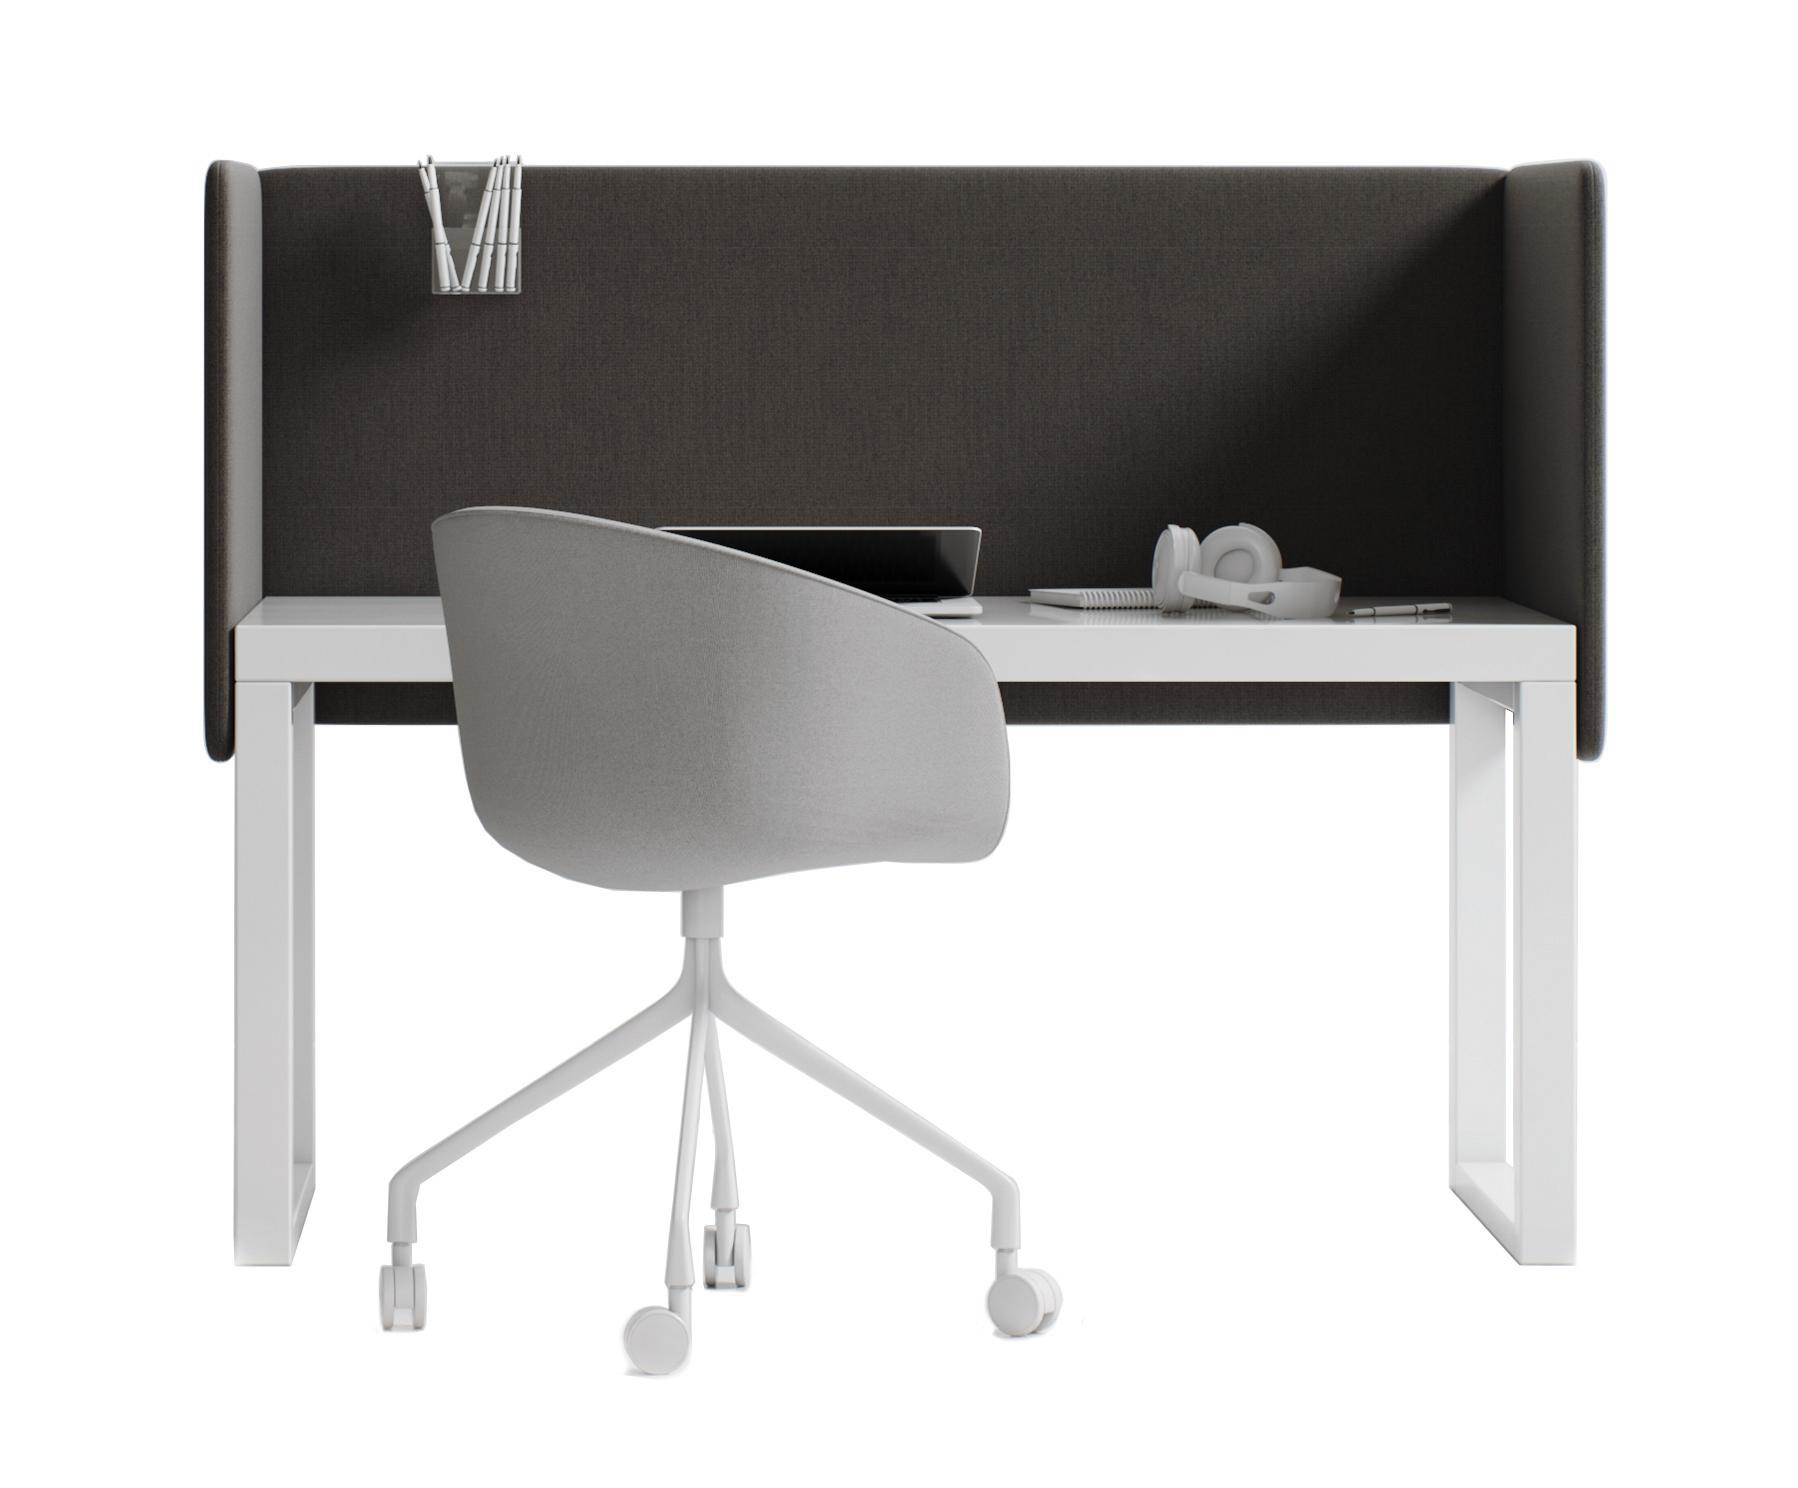 HSH-DUO-D Hush Duo Desk Acoustic Screens